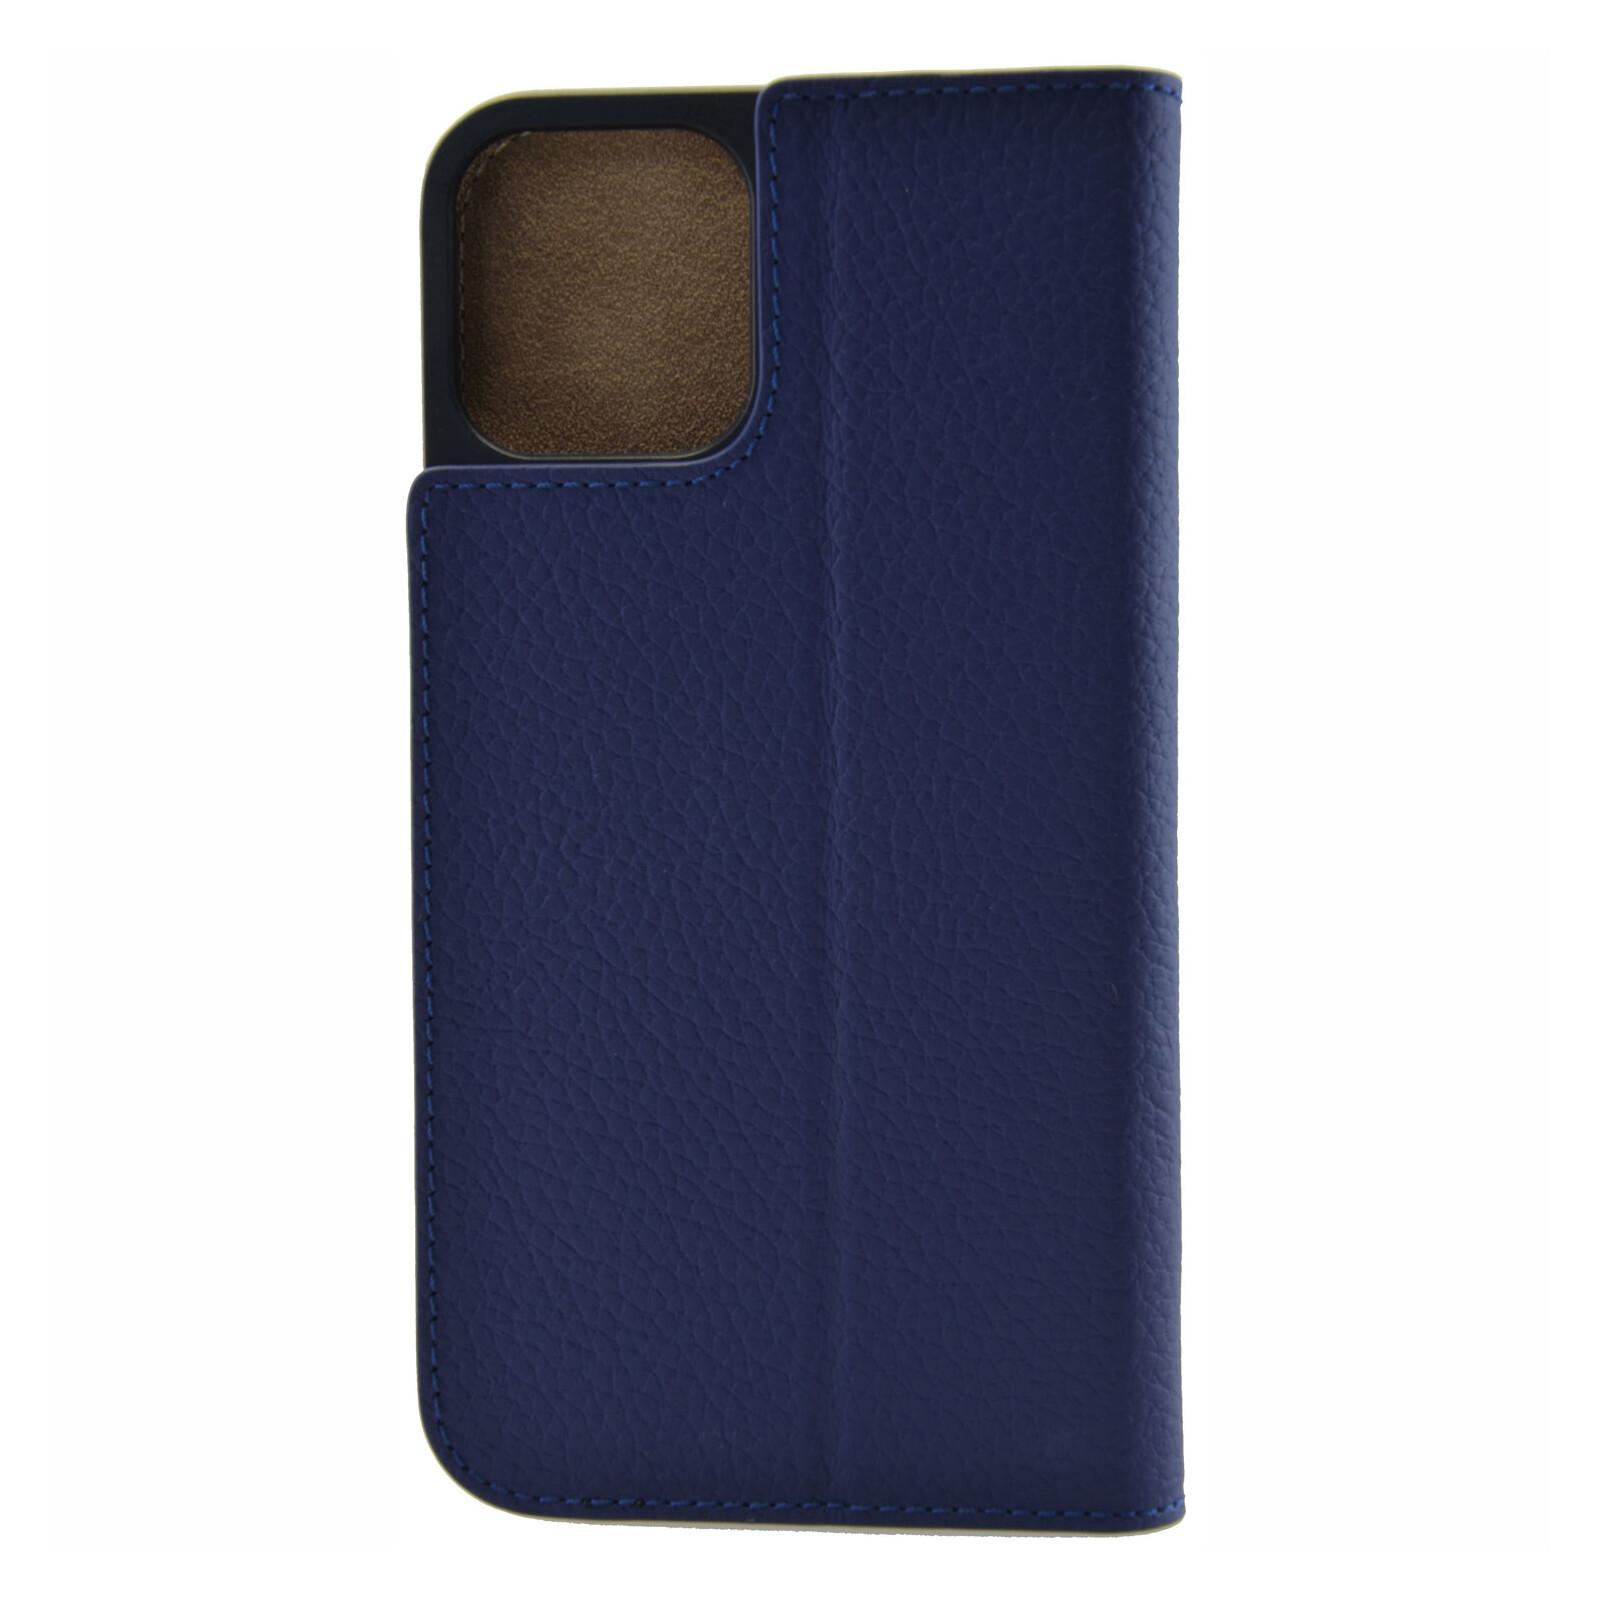 Galeli Booktasche MARC Apple iPhone 12 Max/Pro deep blue